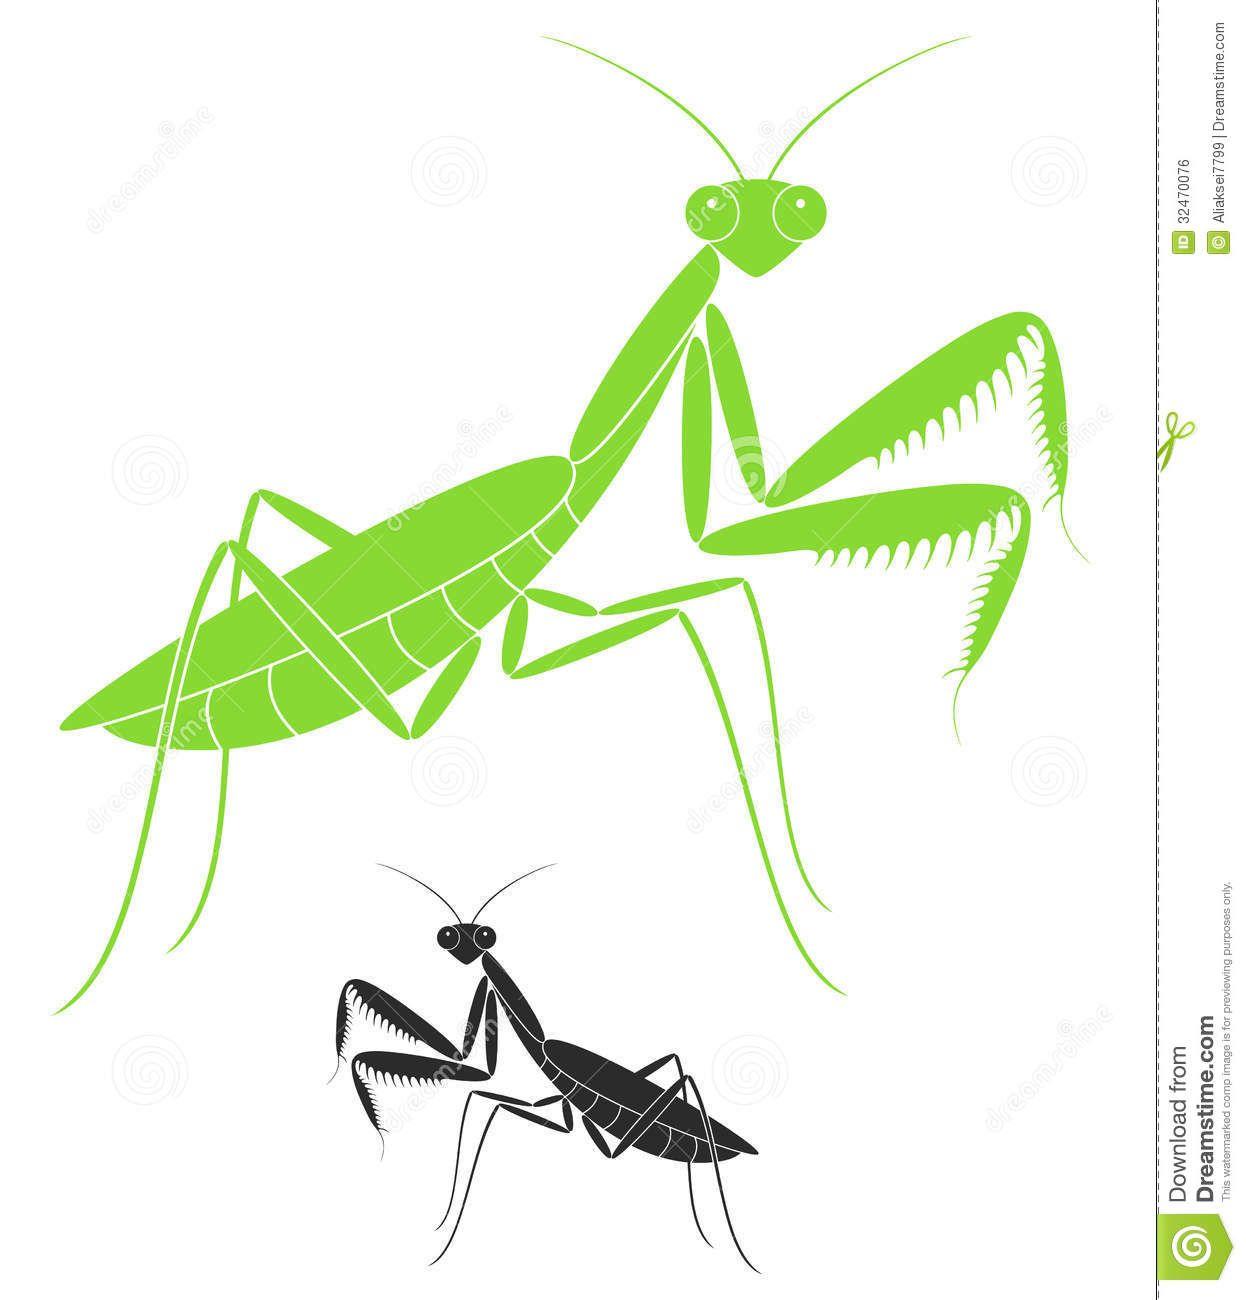 Mantis clipart clip library praying mantis clipart - Google Search | Images | Praying mantis ... clip library